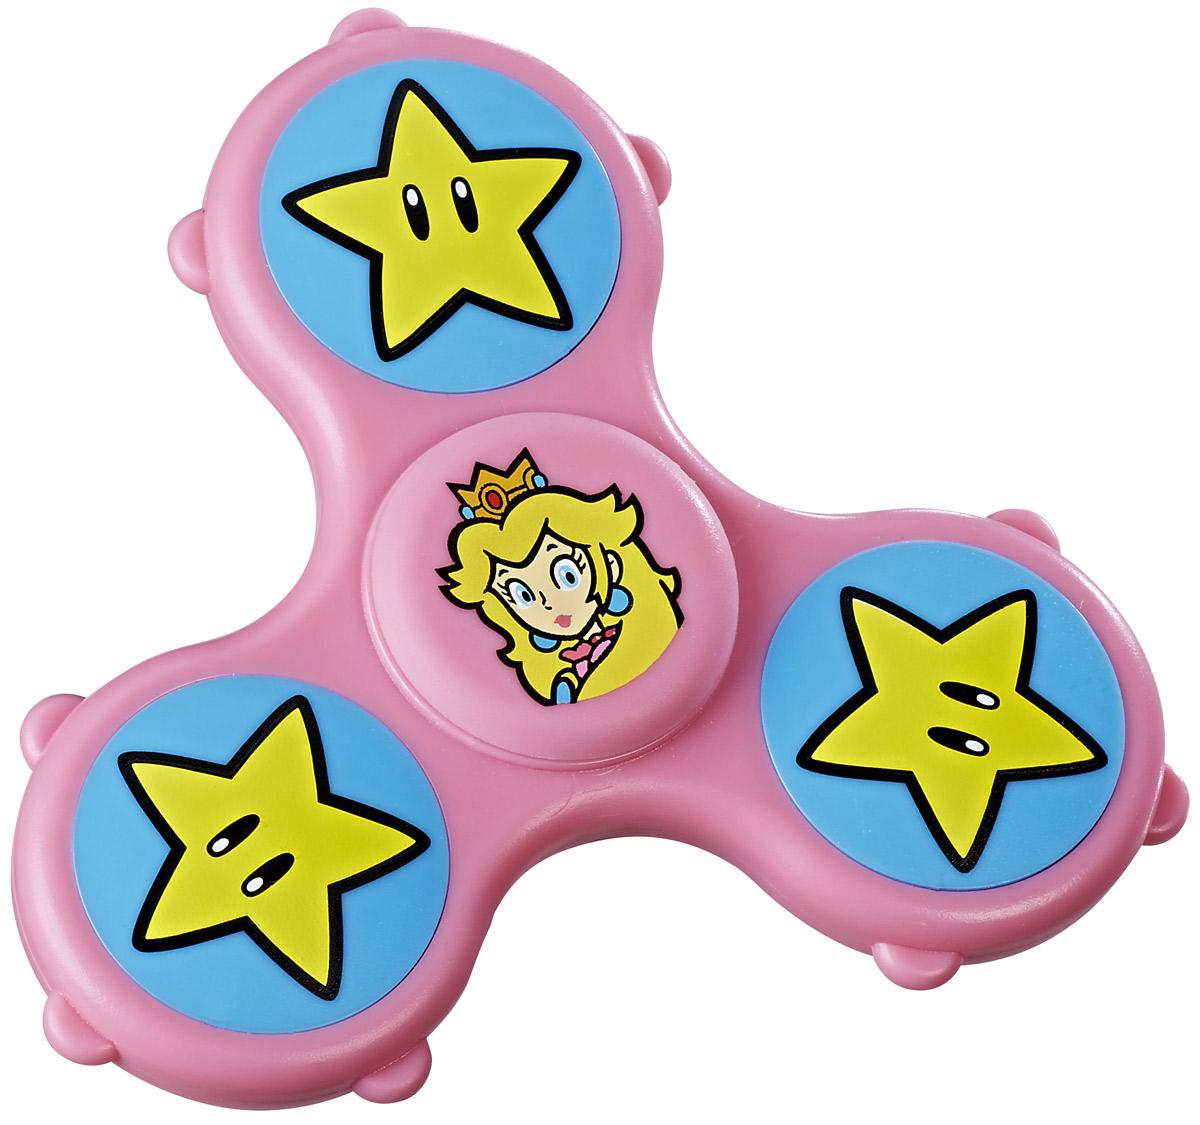 Fidget Its Спиннер Princess Peach fidget its антистрессовая игрушка кубик transformers bumblebee